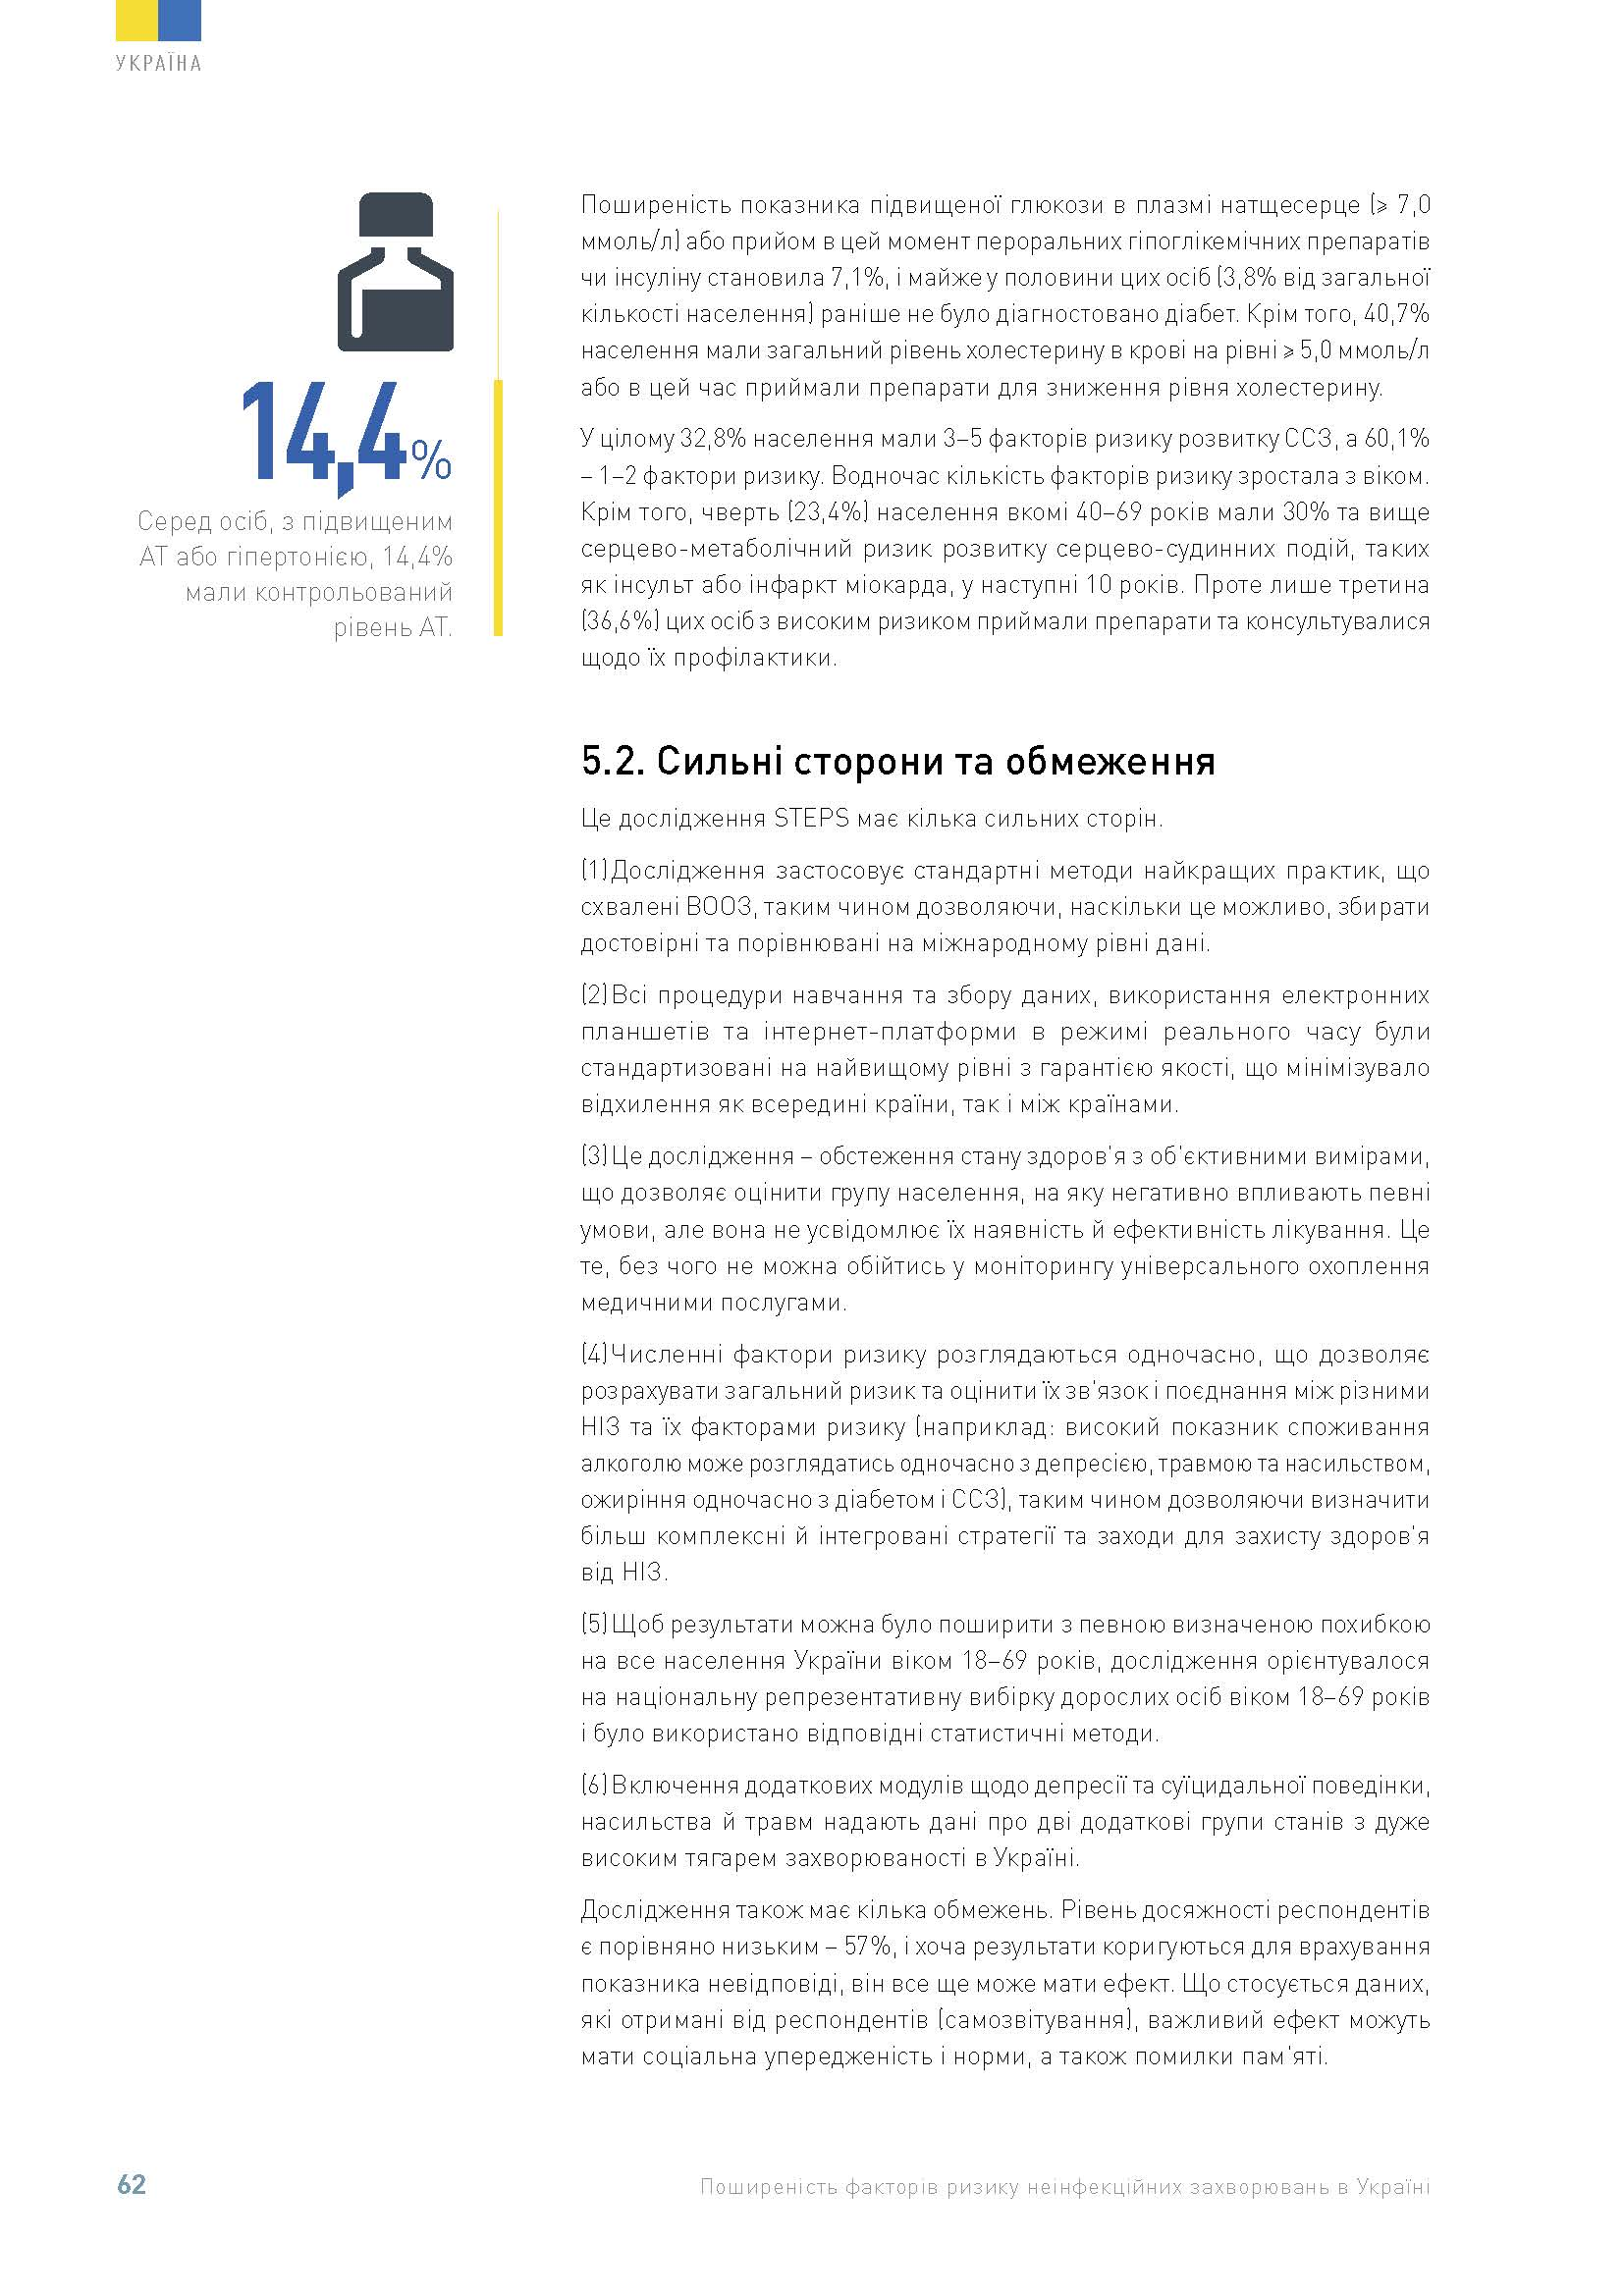 STEPS_Report_ukr_Страница_82